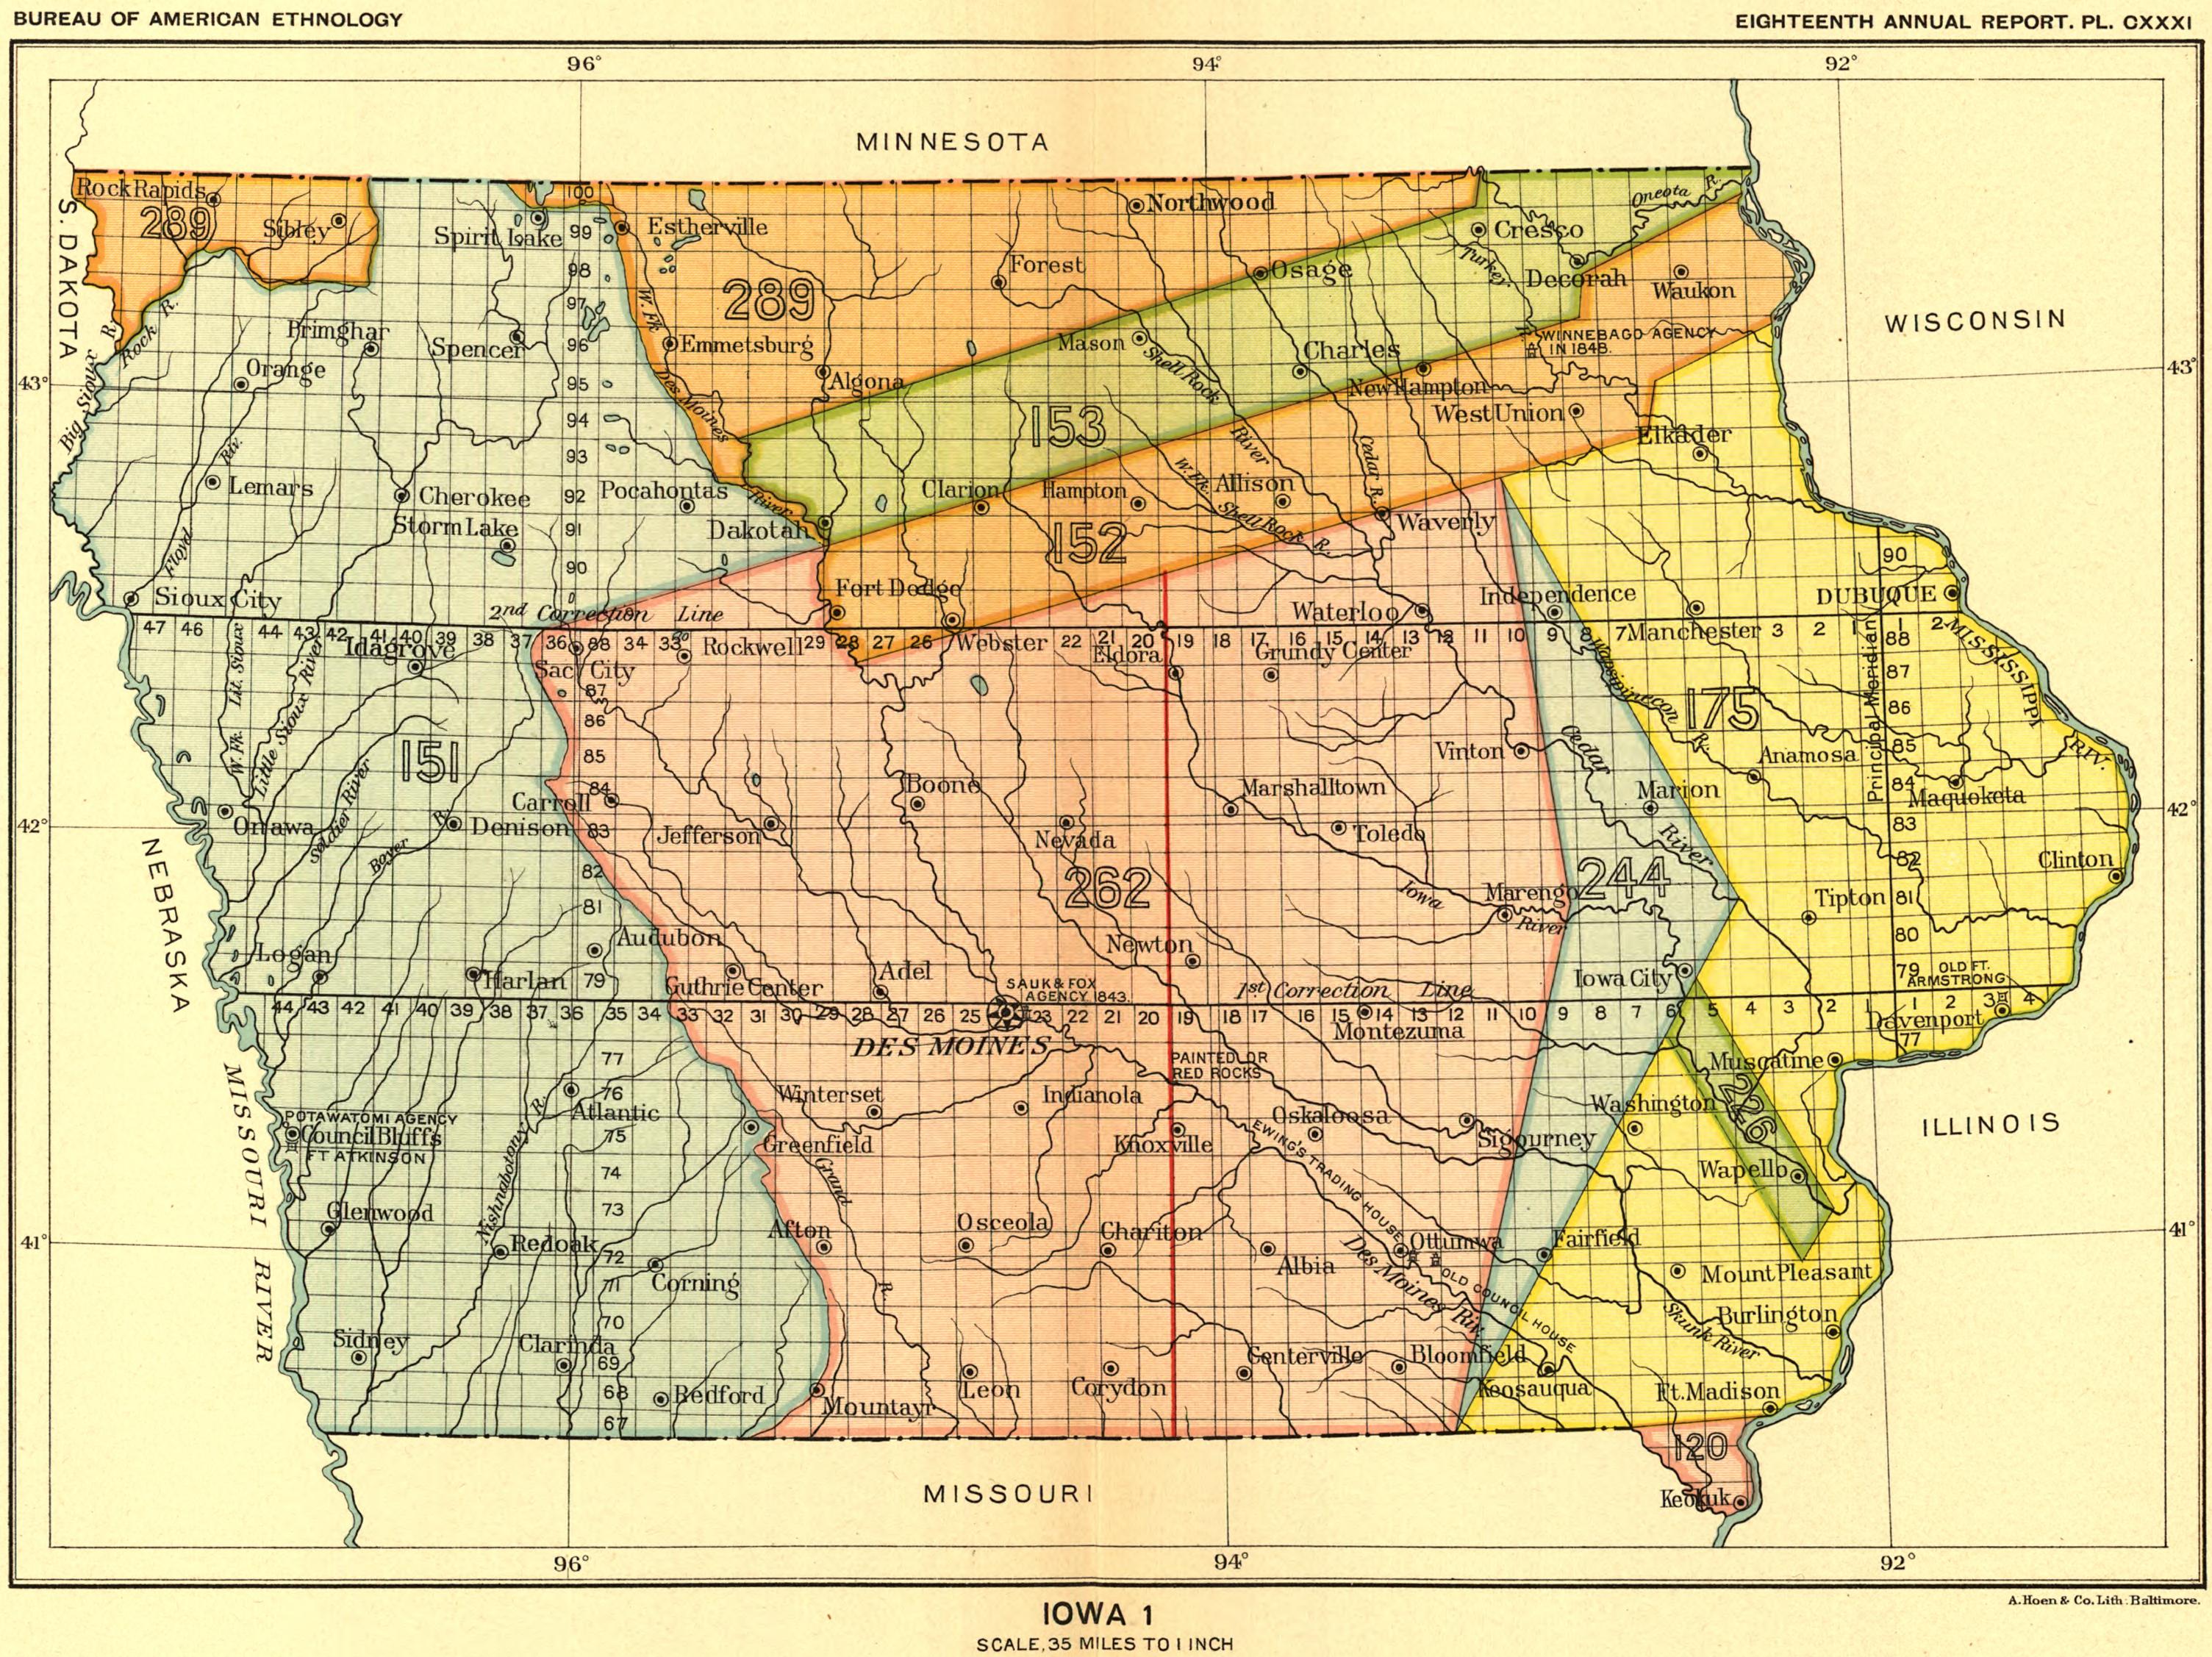 Keokuk's Reserve - Wikipedia on oelwein iowa state map, cresco iowa state map, des moines iowa state map, ankeny iowa state map, dubuque iowa state map, walcott iowa state map, burlington iowa state map, grinnell iowa state map, ames iowa state map,